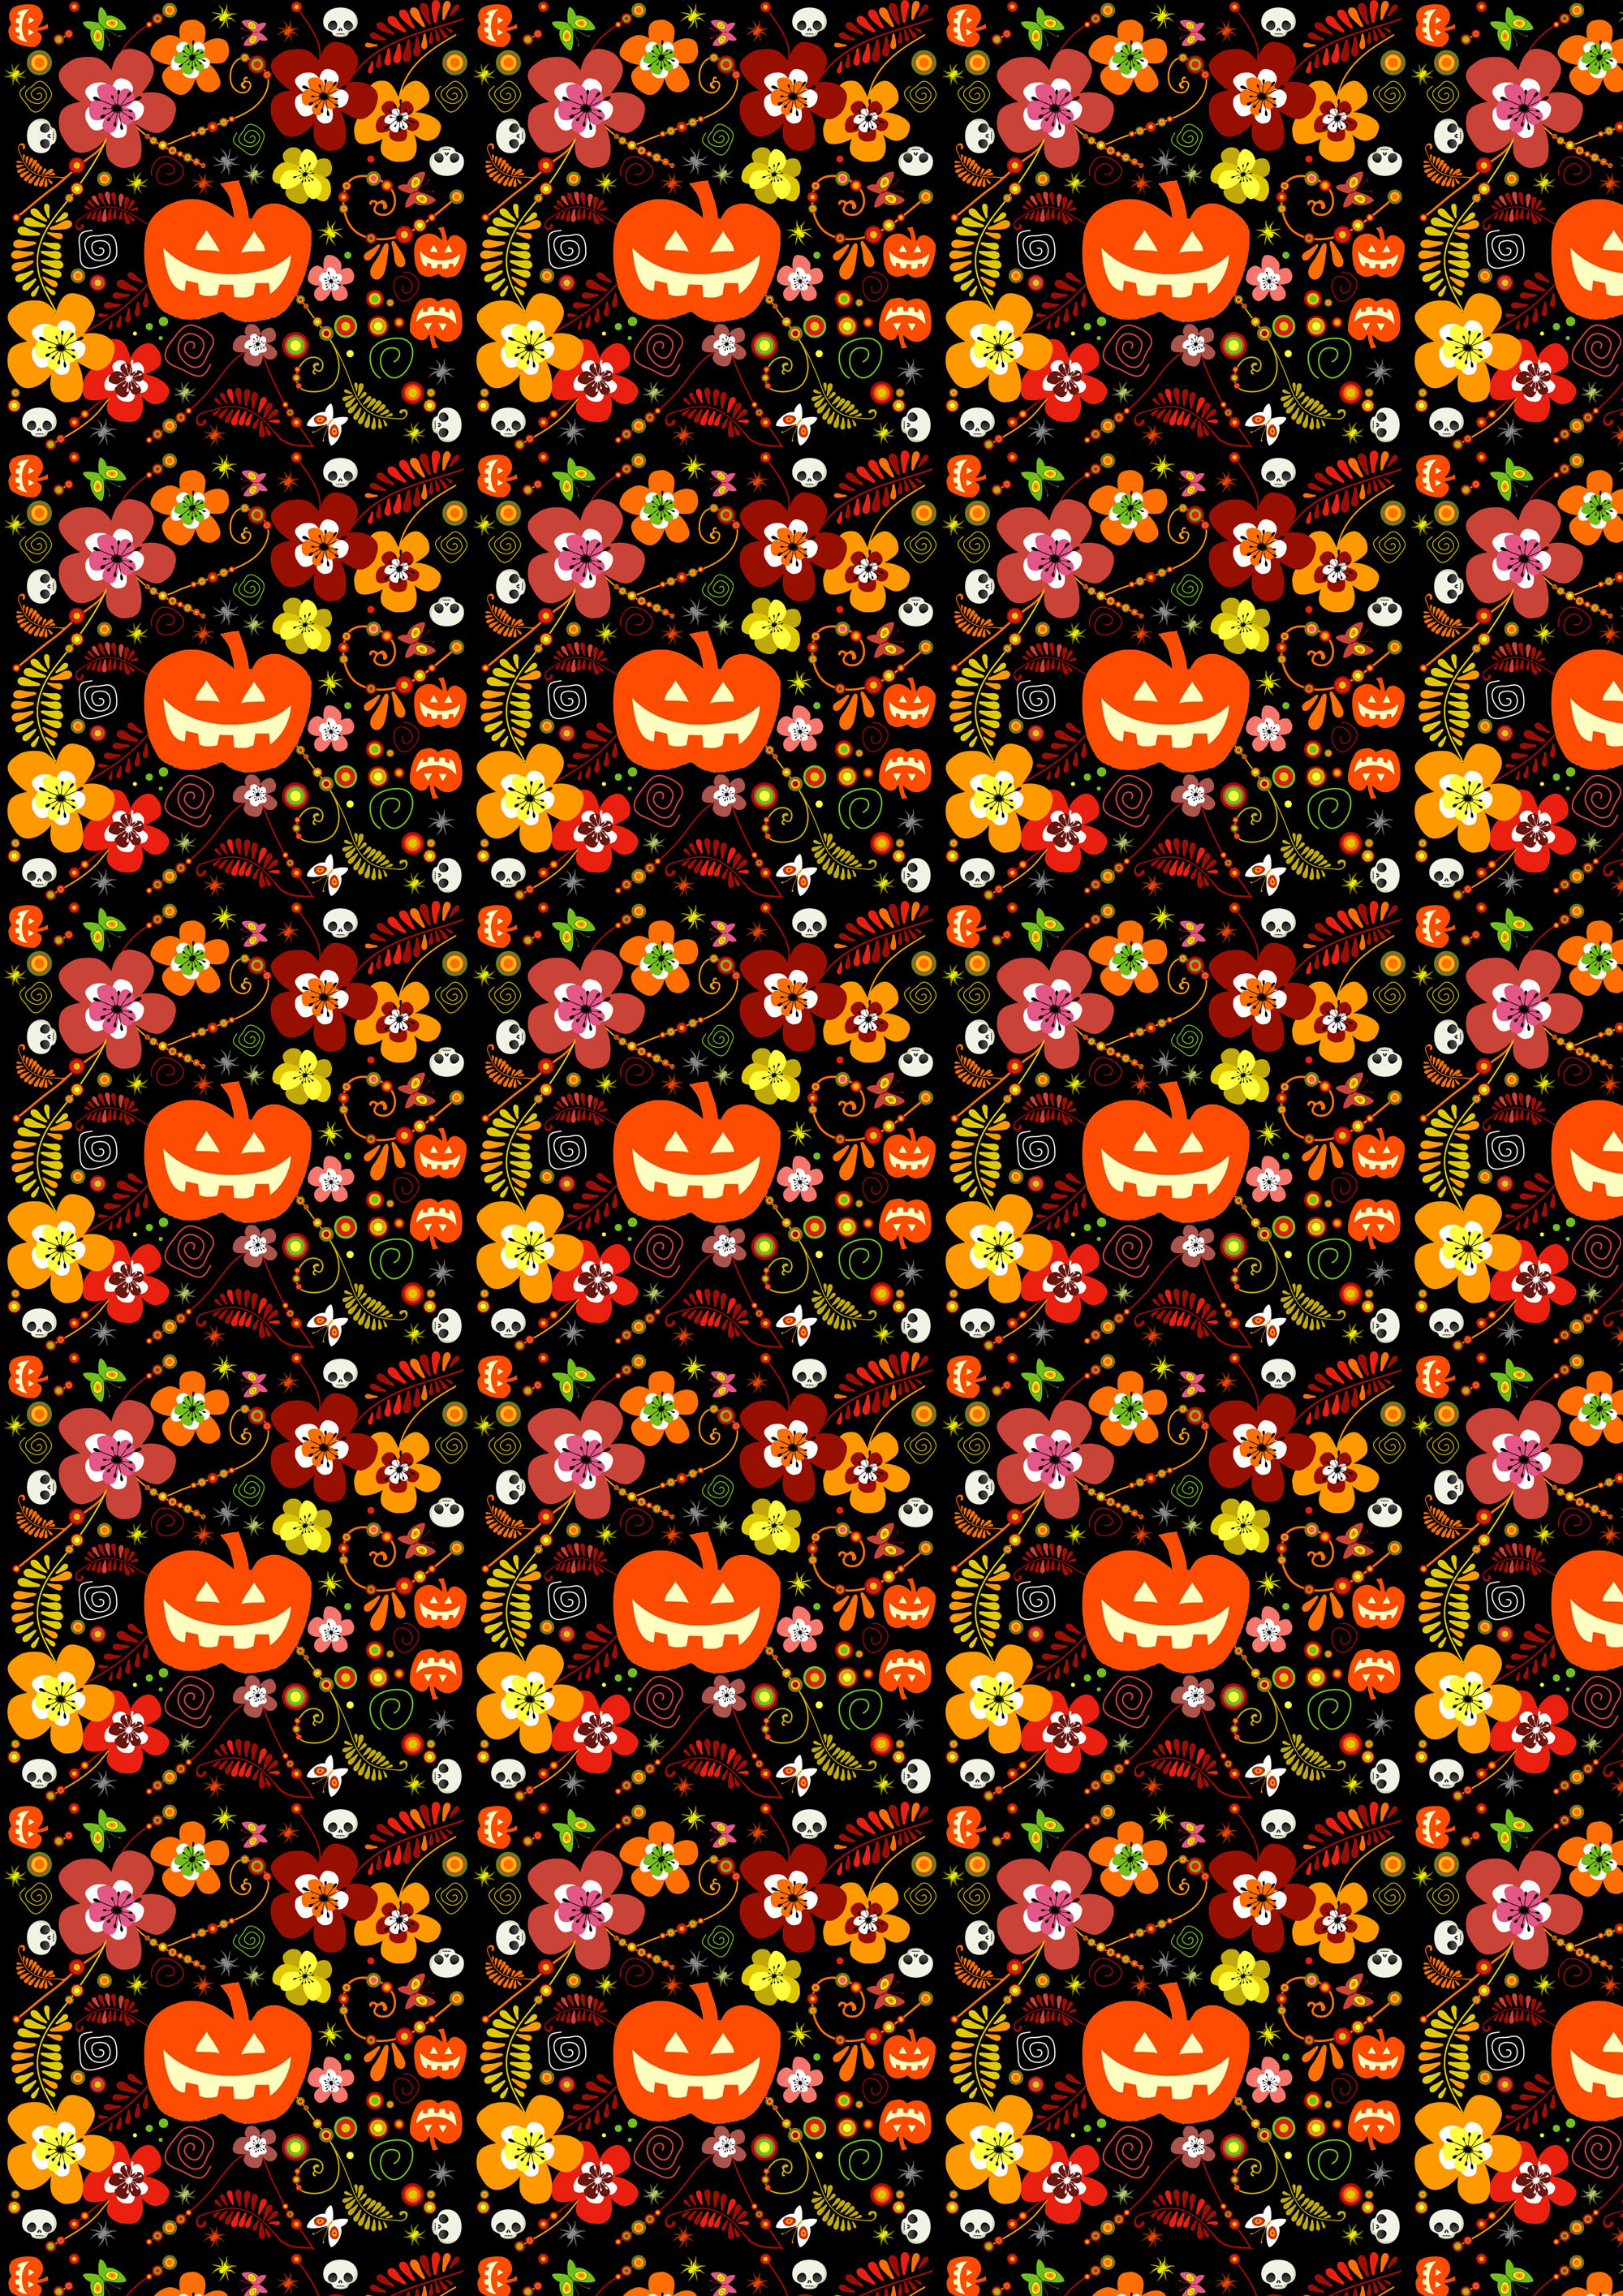 Free Scrapbook Paper: Halloween Pumpkins And Flowers | Rooftop Post - Free Printable Halloween Paper Crafts